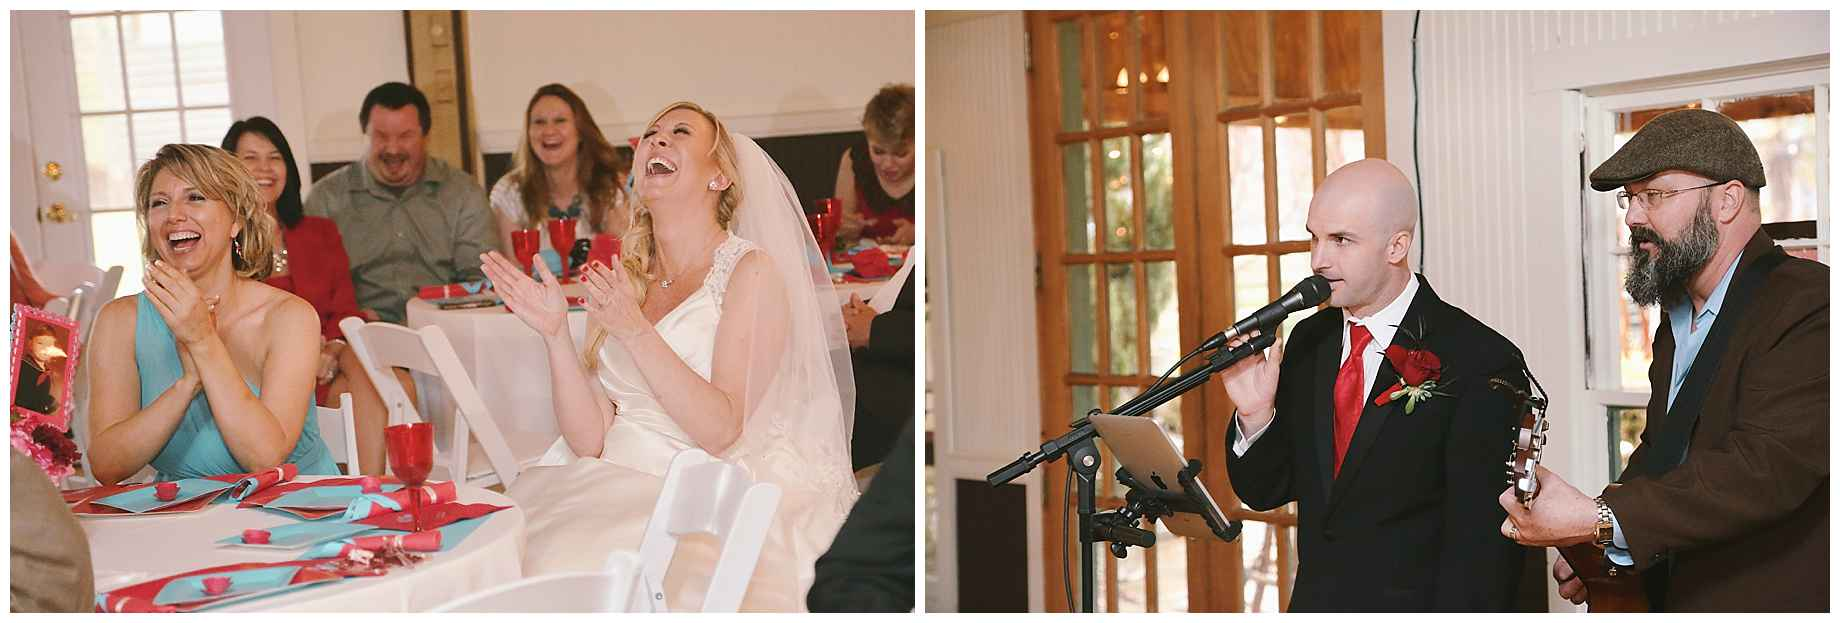 elmwood-gardens-wedding-photos-17